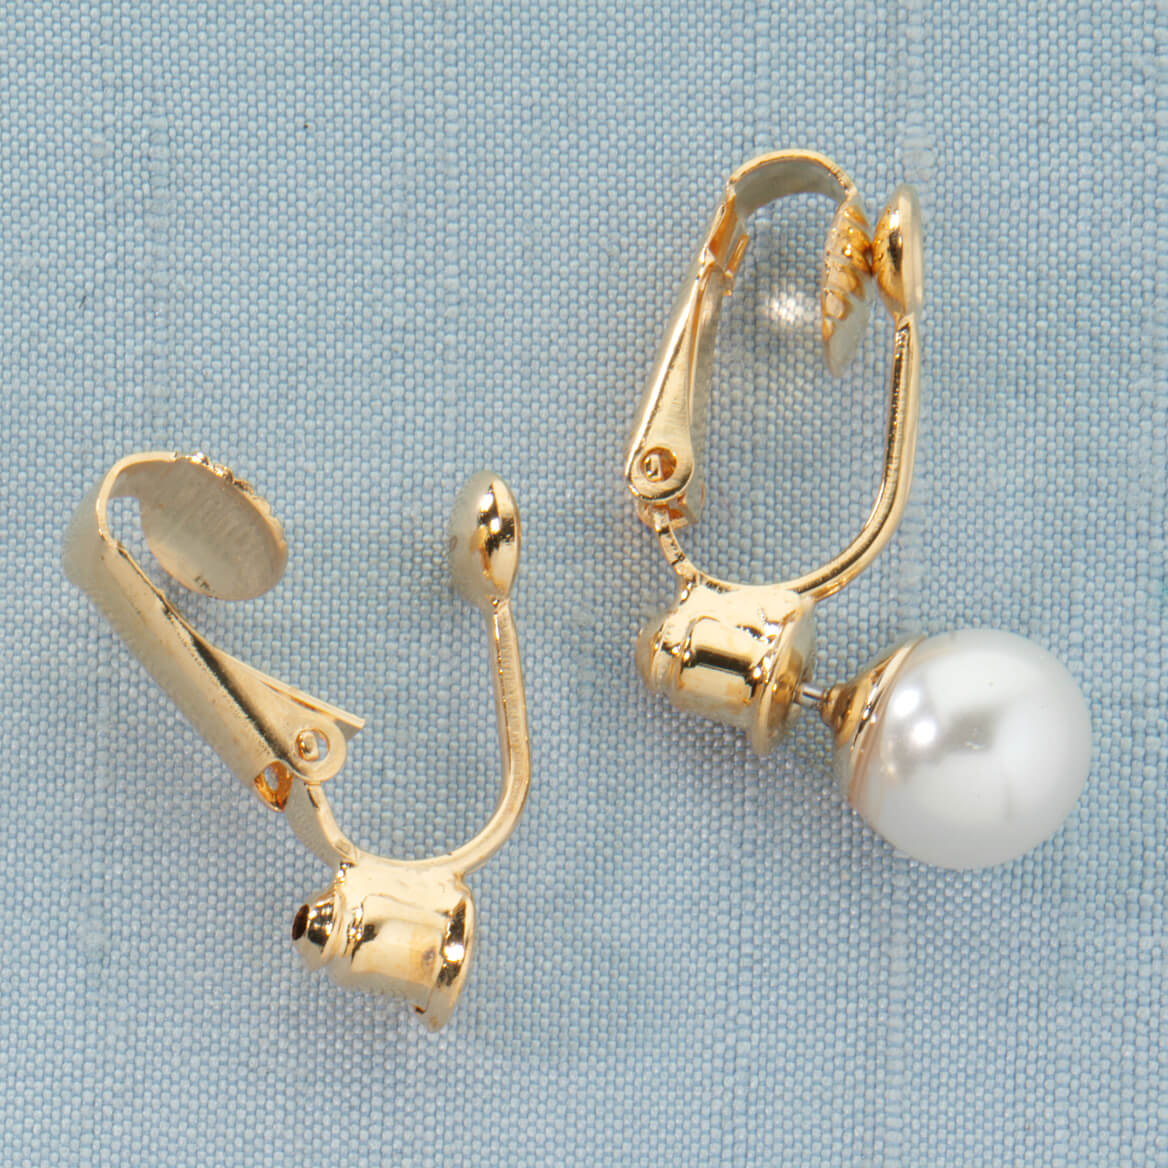 Clip On Earrings Converter - 6 Pair-312116